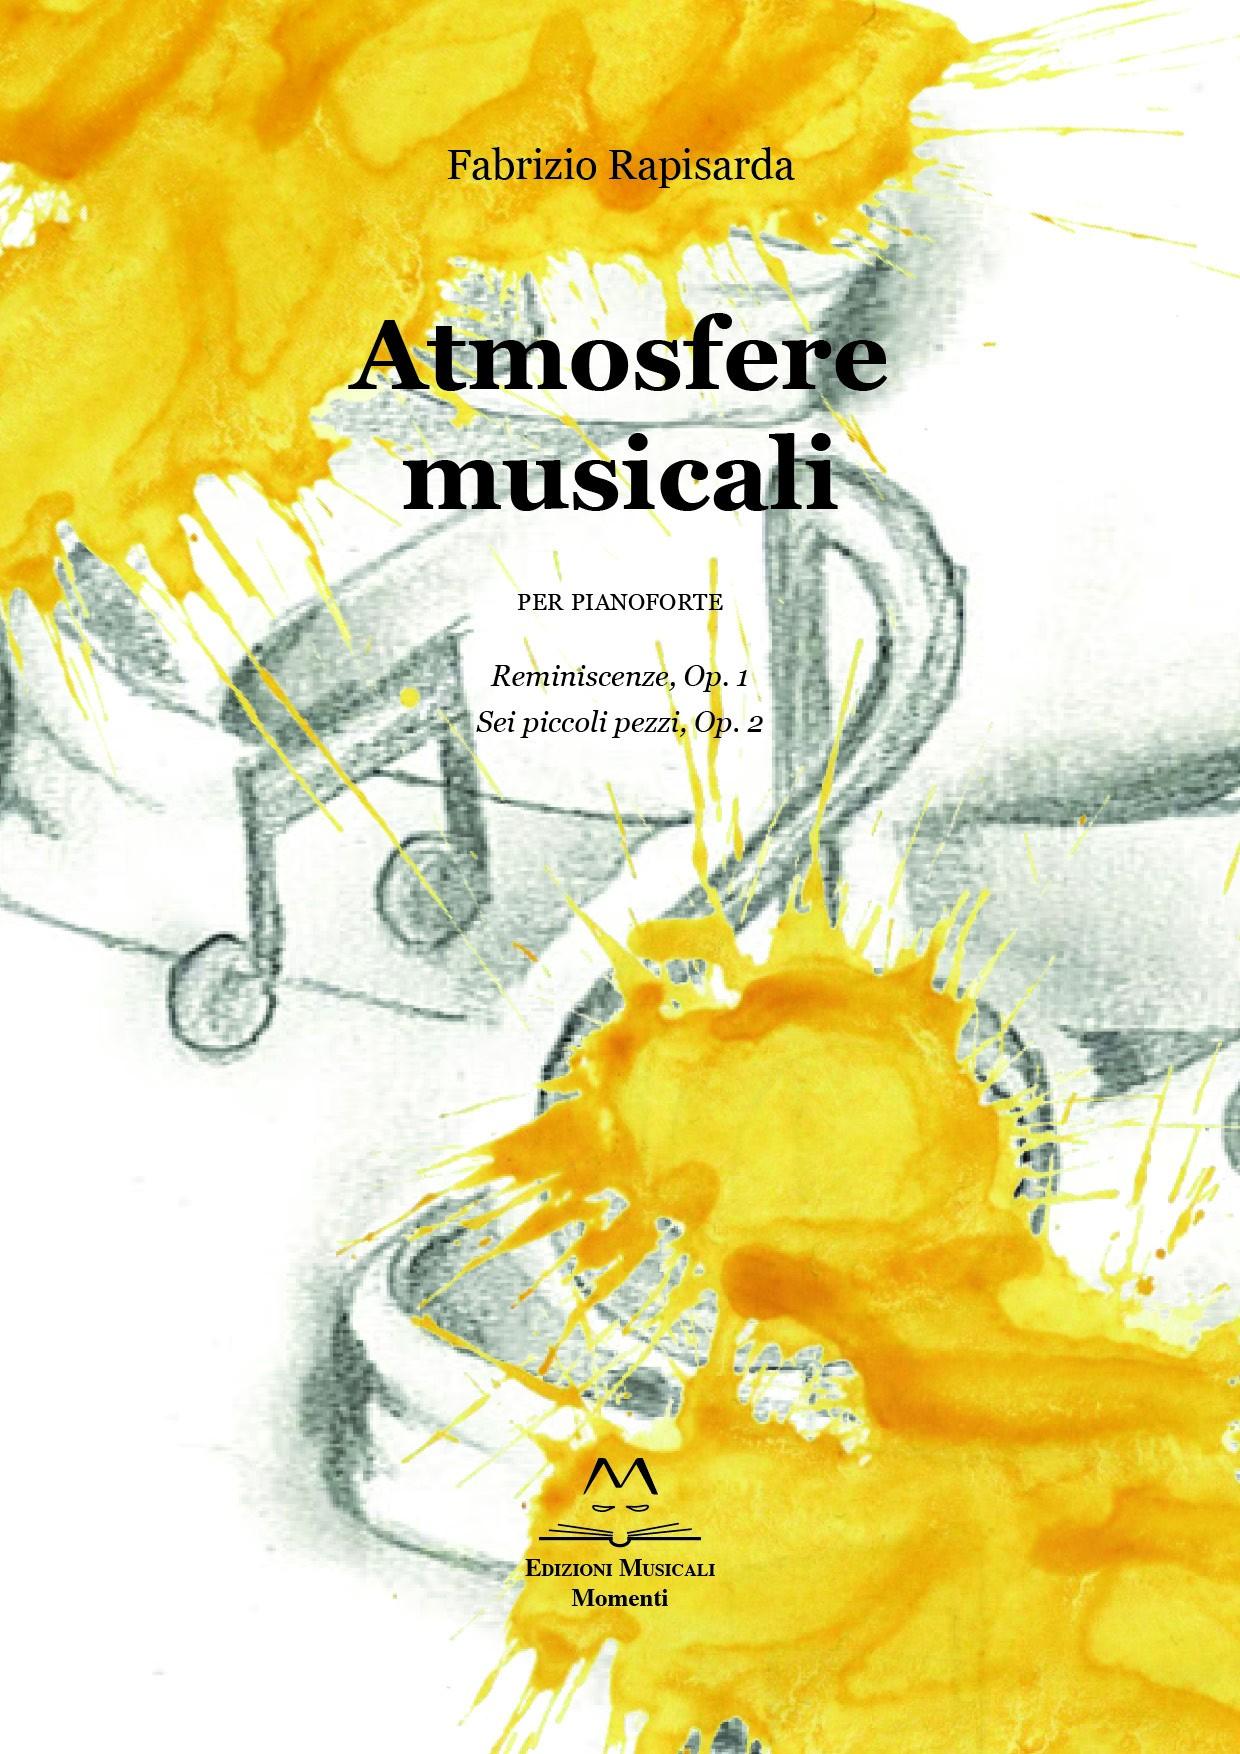 Atmosfere musicali di Fabrizio Rapisarda